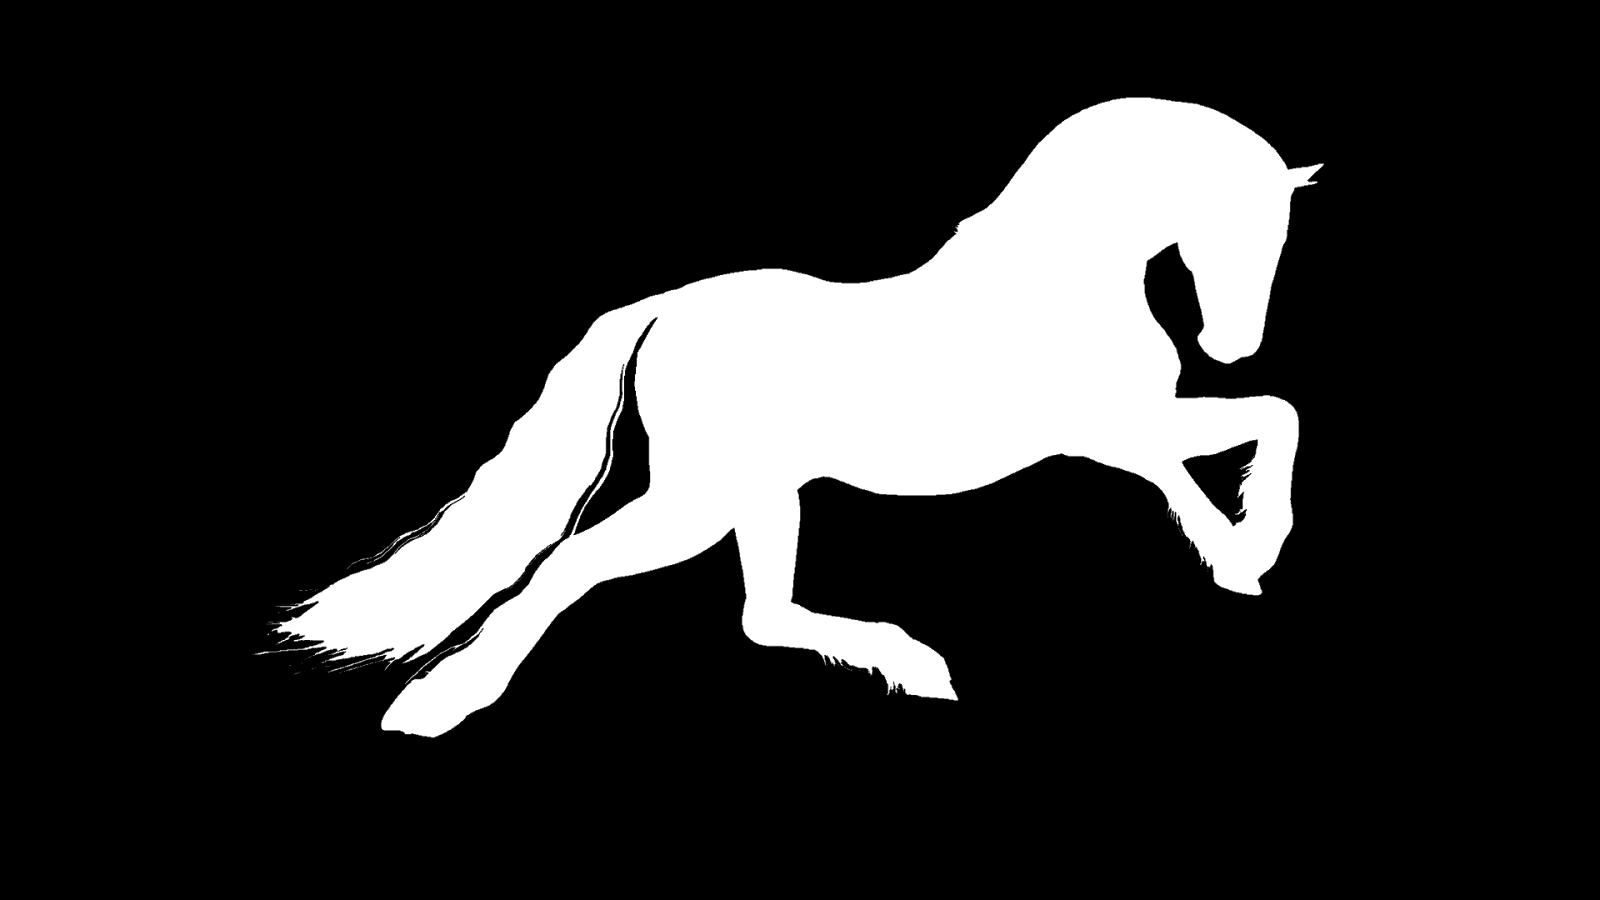 Silhueta invertida - Cavalo PNG